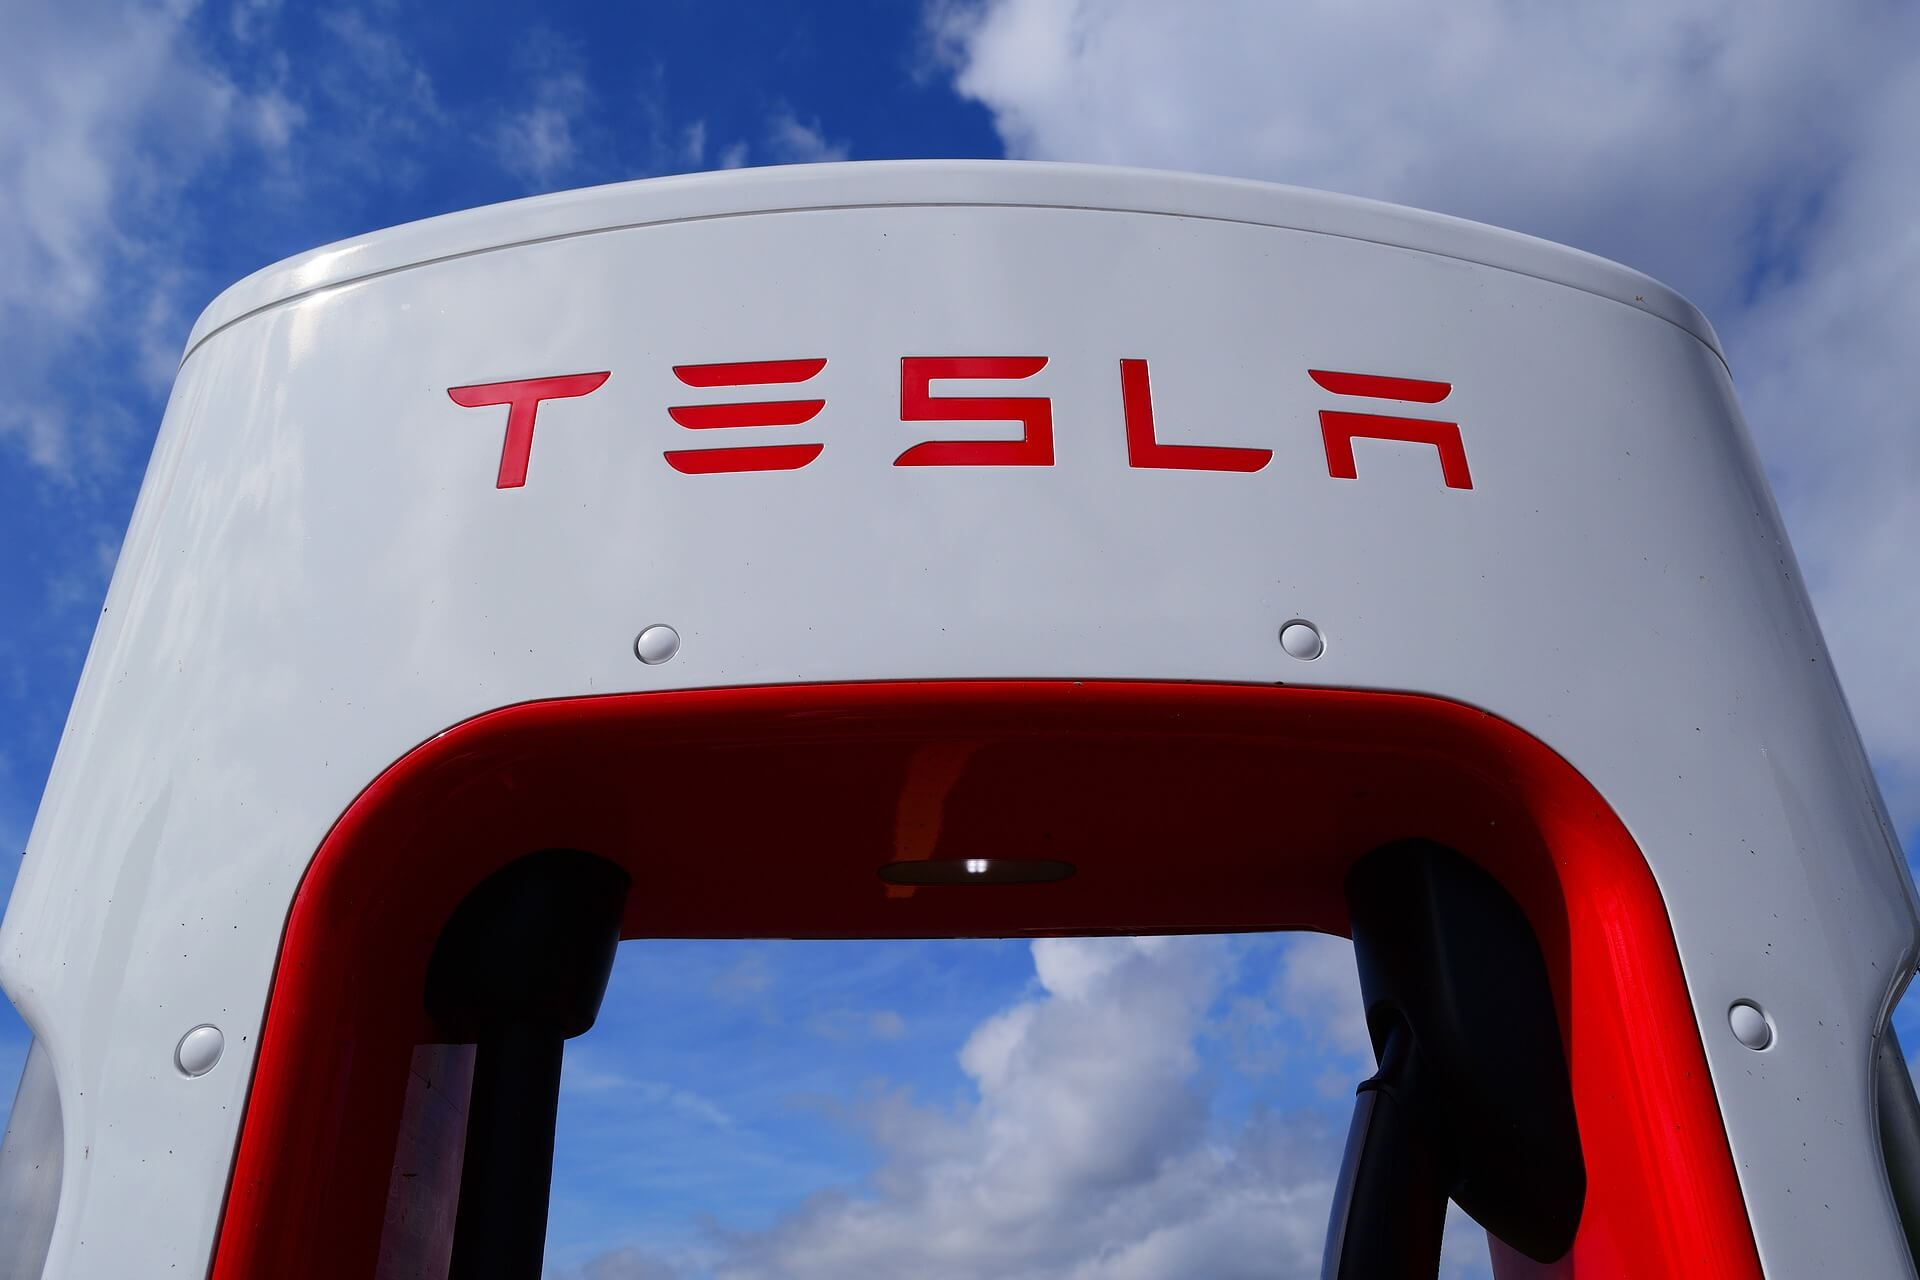 Elon Musk net worth - The richest man in the world